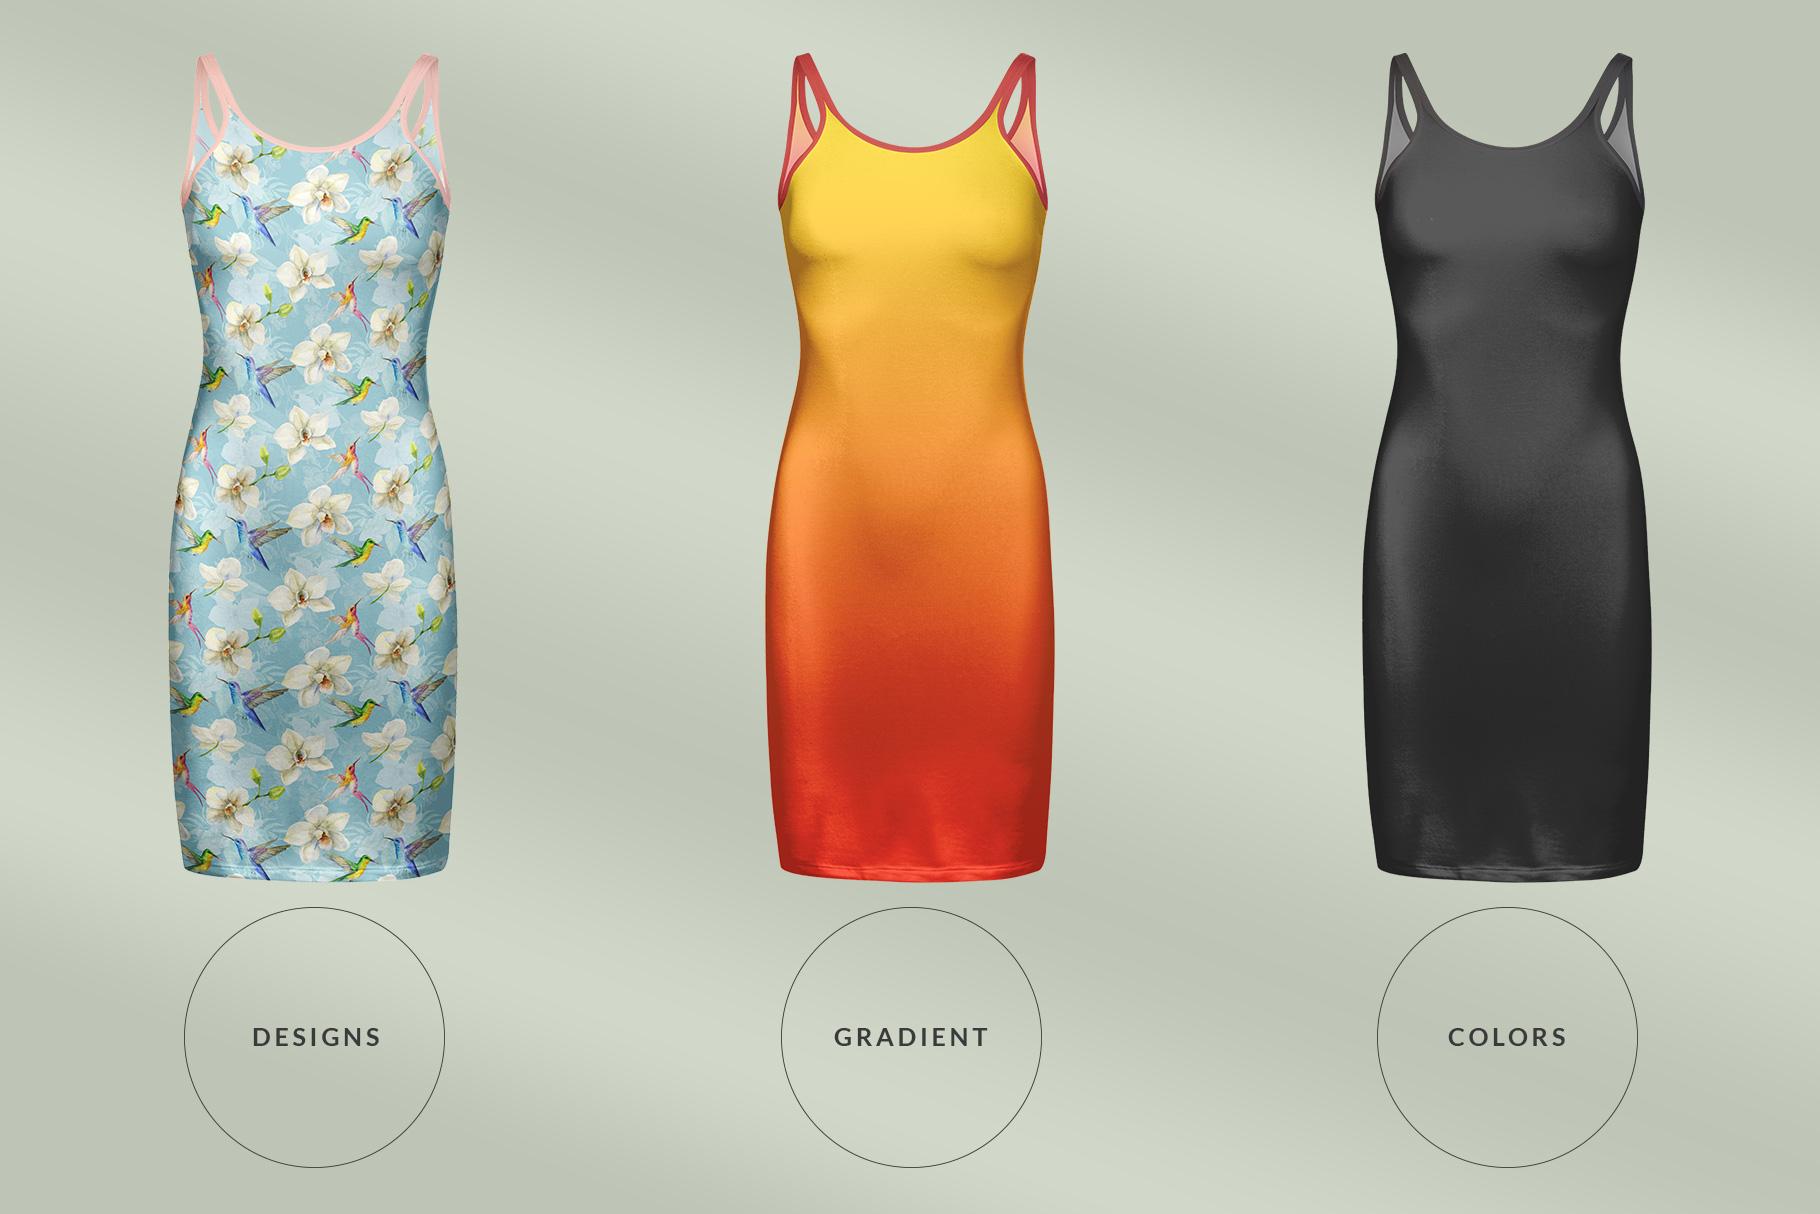 types of the women's long strap dress mockup